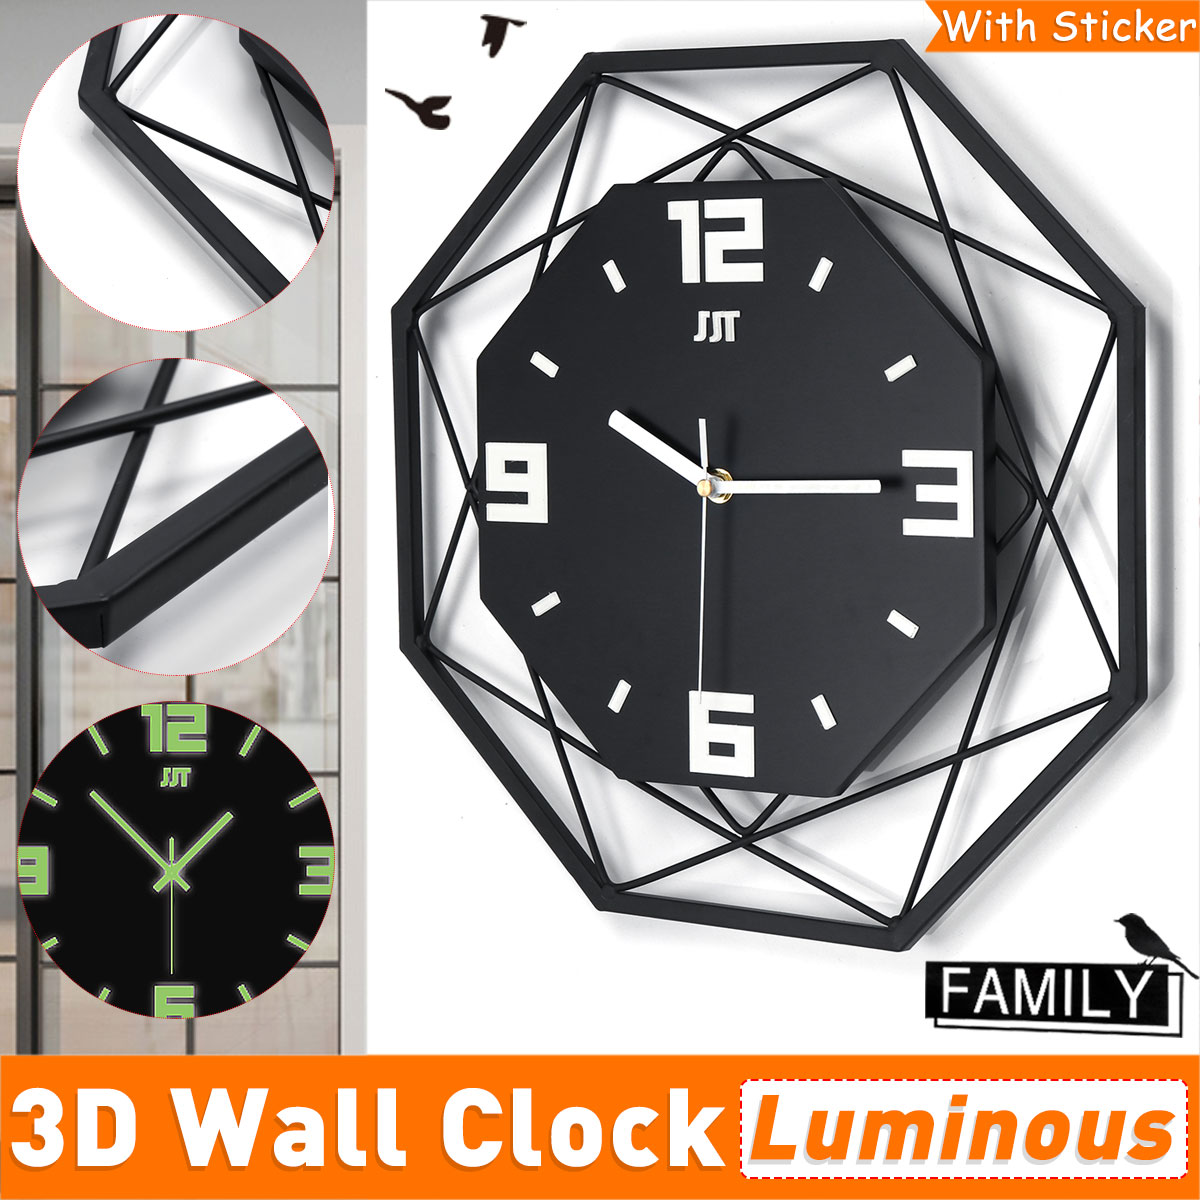 14 3d Silent Luminous Wall Clock Glow In The Dark Decorative Clocks Home Living Room Bedroom Decor Walmart Canada